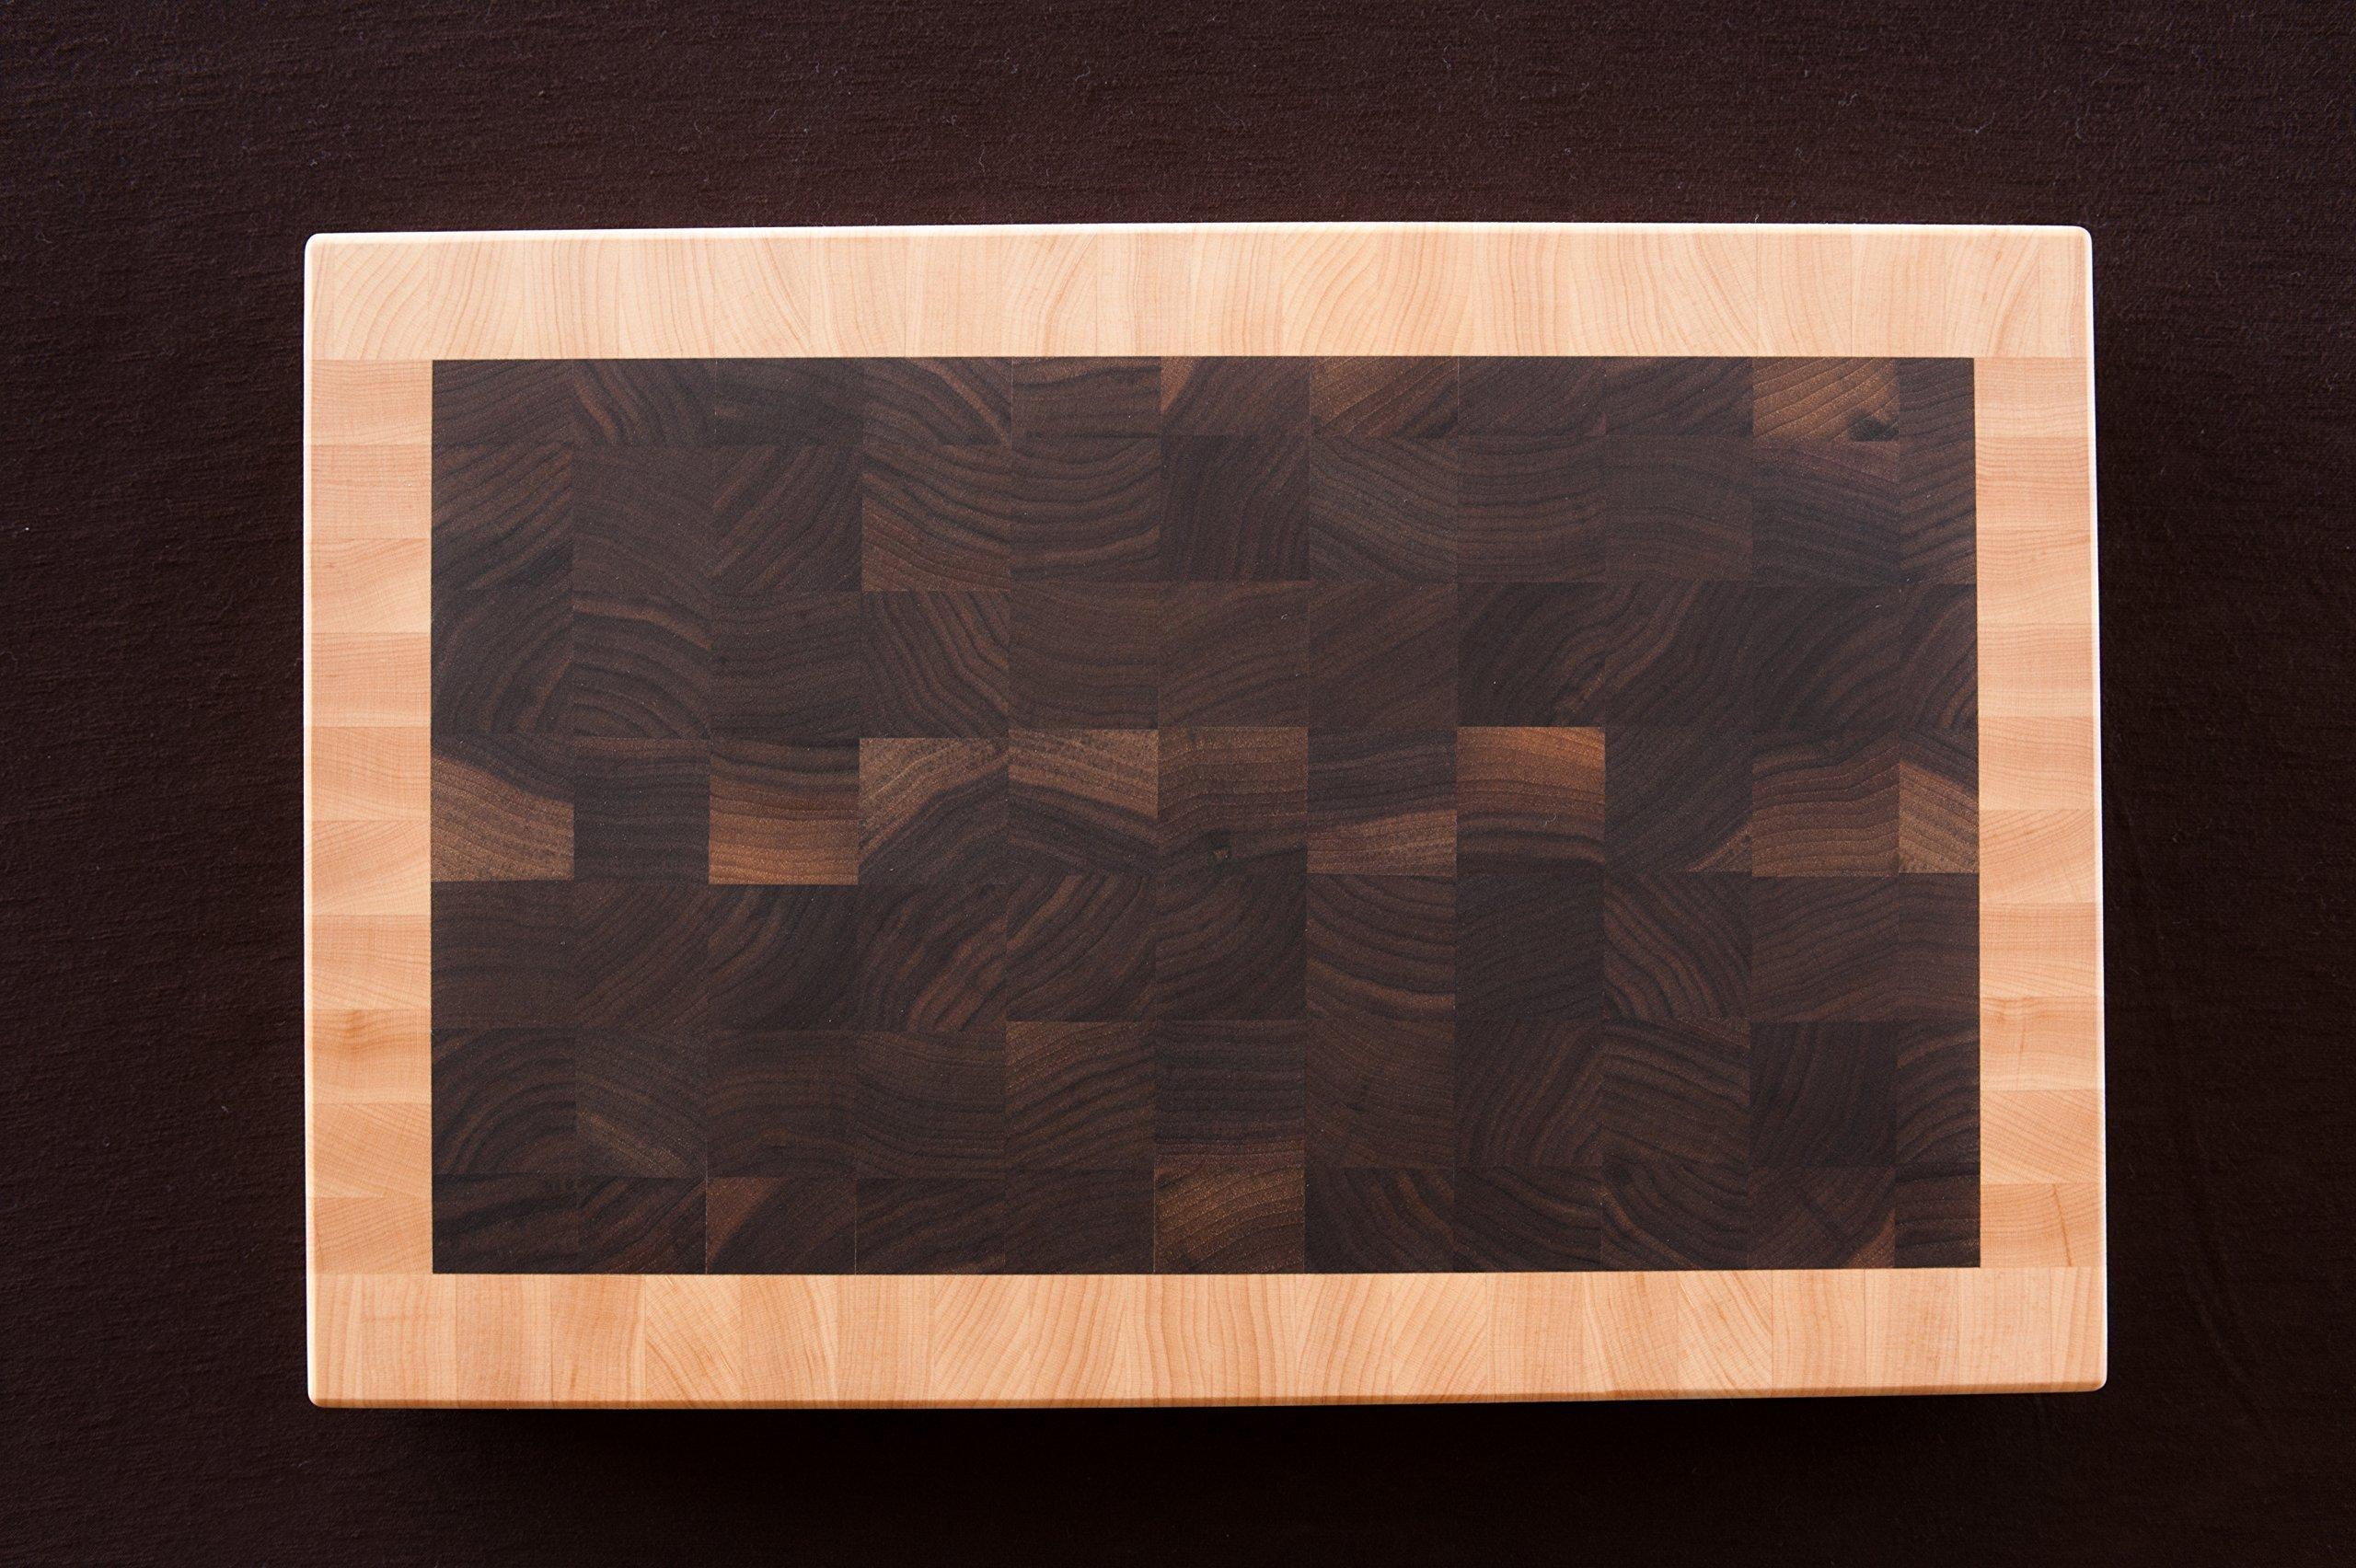 Chopping Blox Walnut and Maple End Grain Handmade Wood Cutting Board Large - (SIXM-W)